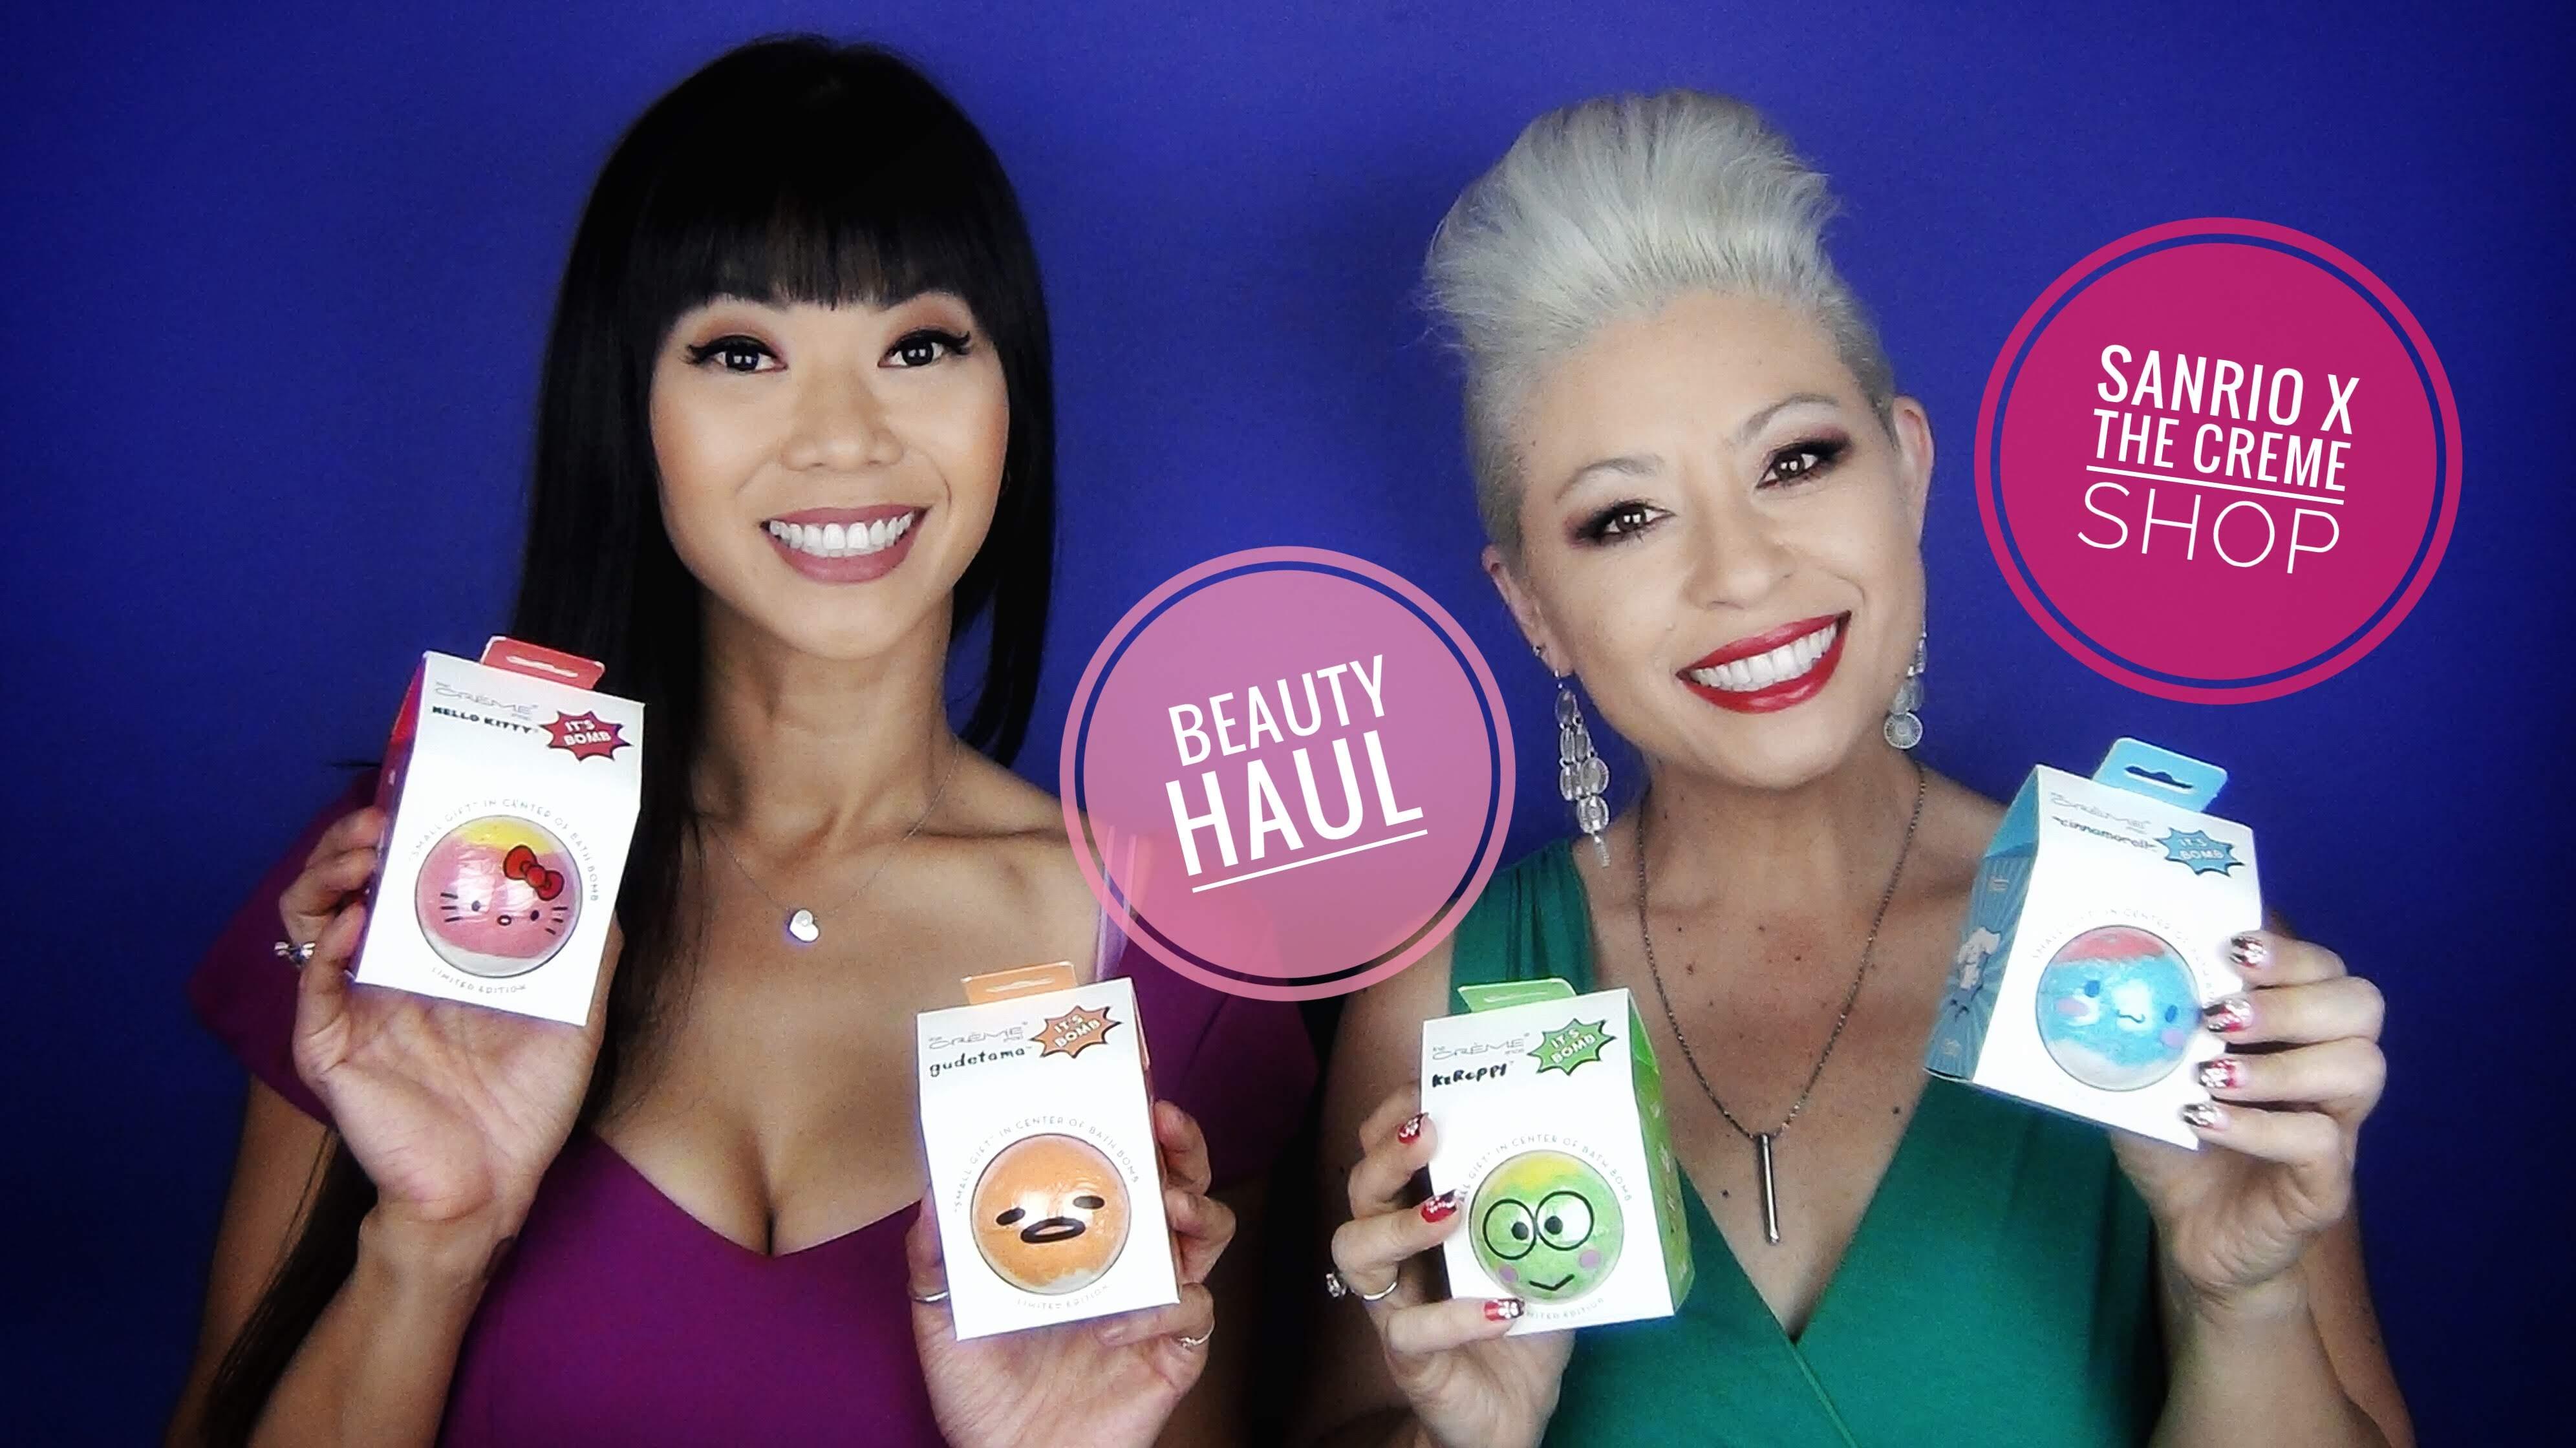 ce07cce7a Beauty Haul – Sanrio x The Creme Shop Collab